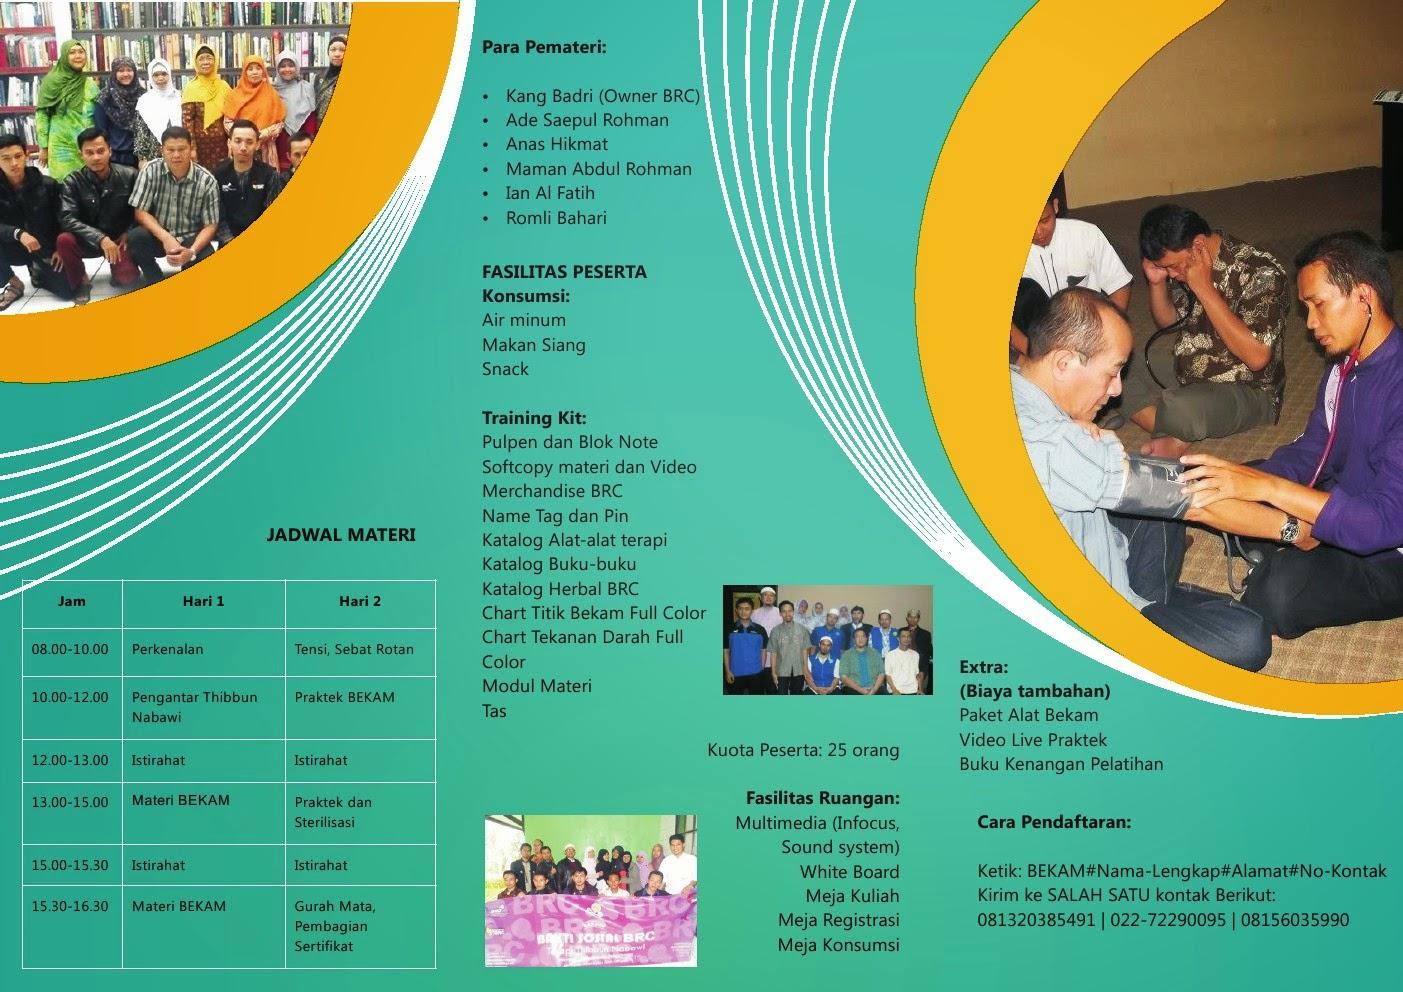 Klinik Pengobatan Bekam Steril Alternatif Islami Cirebon